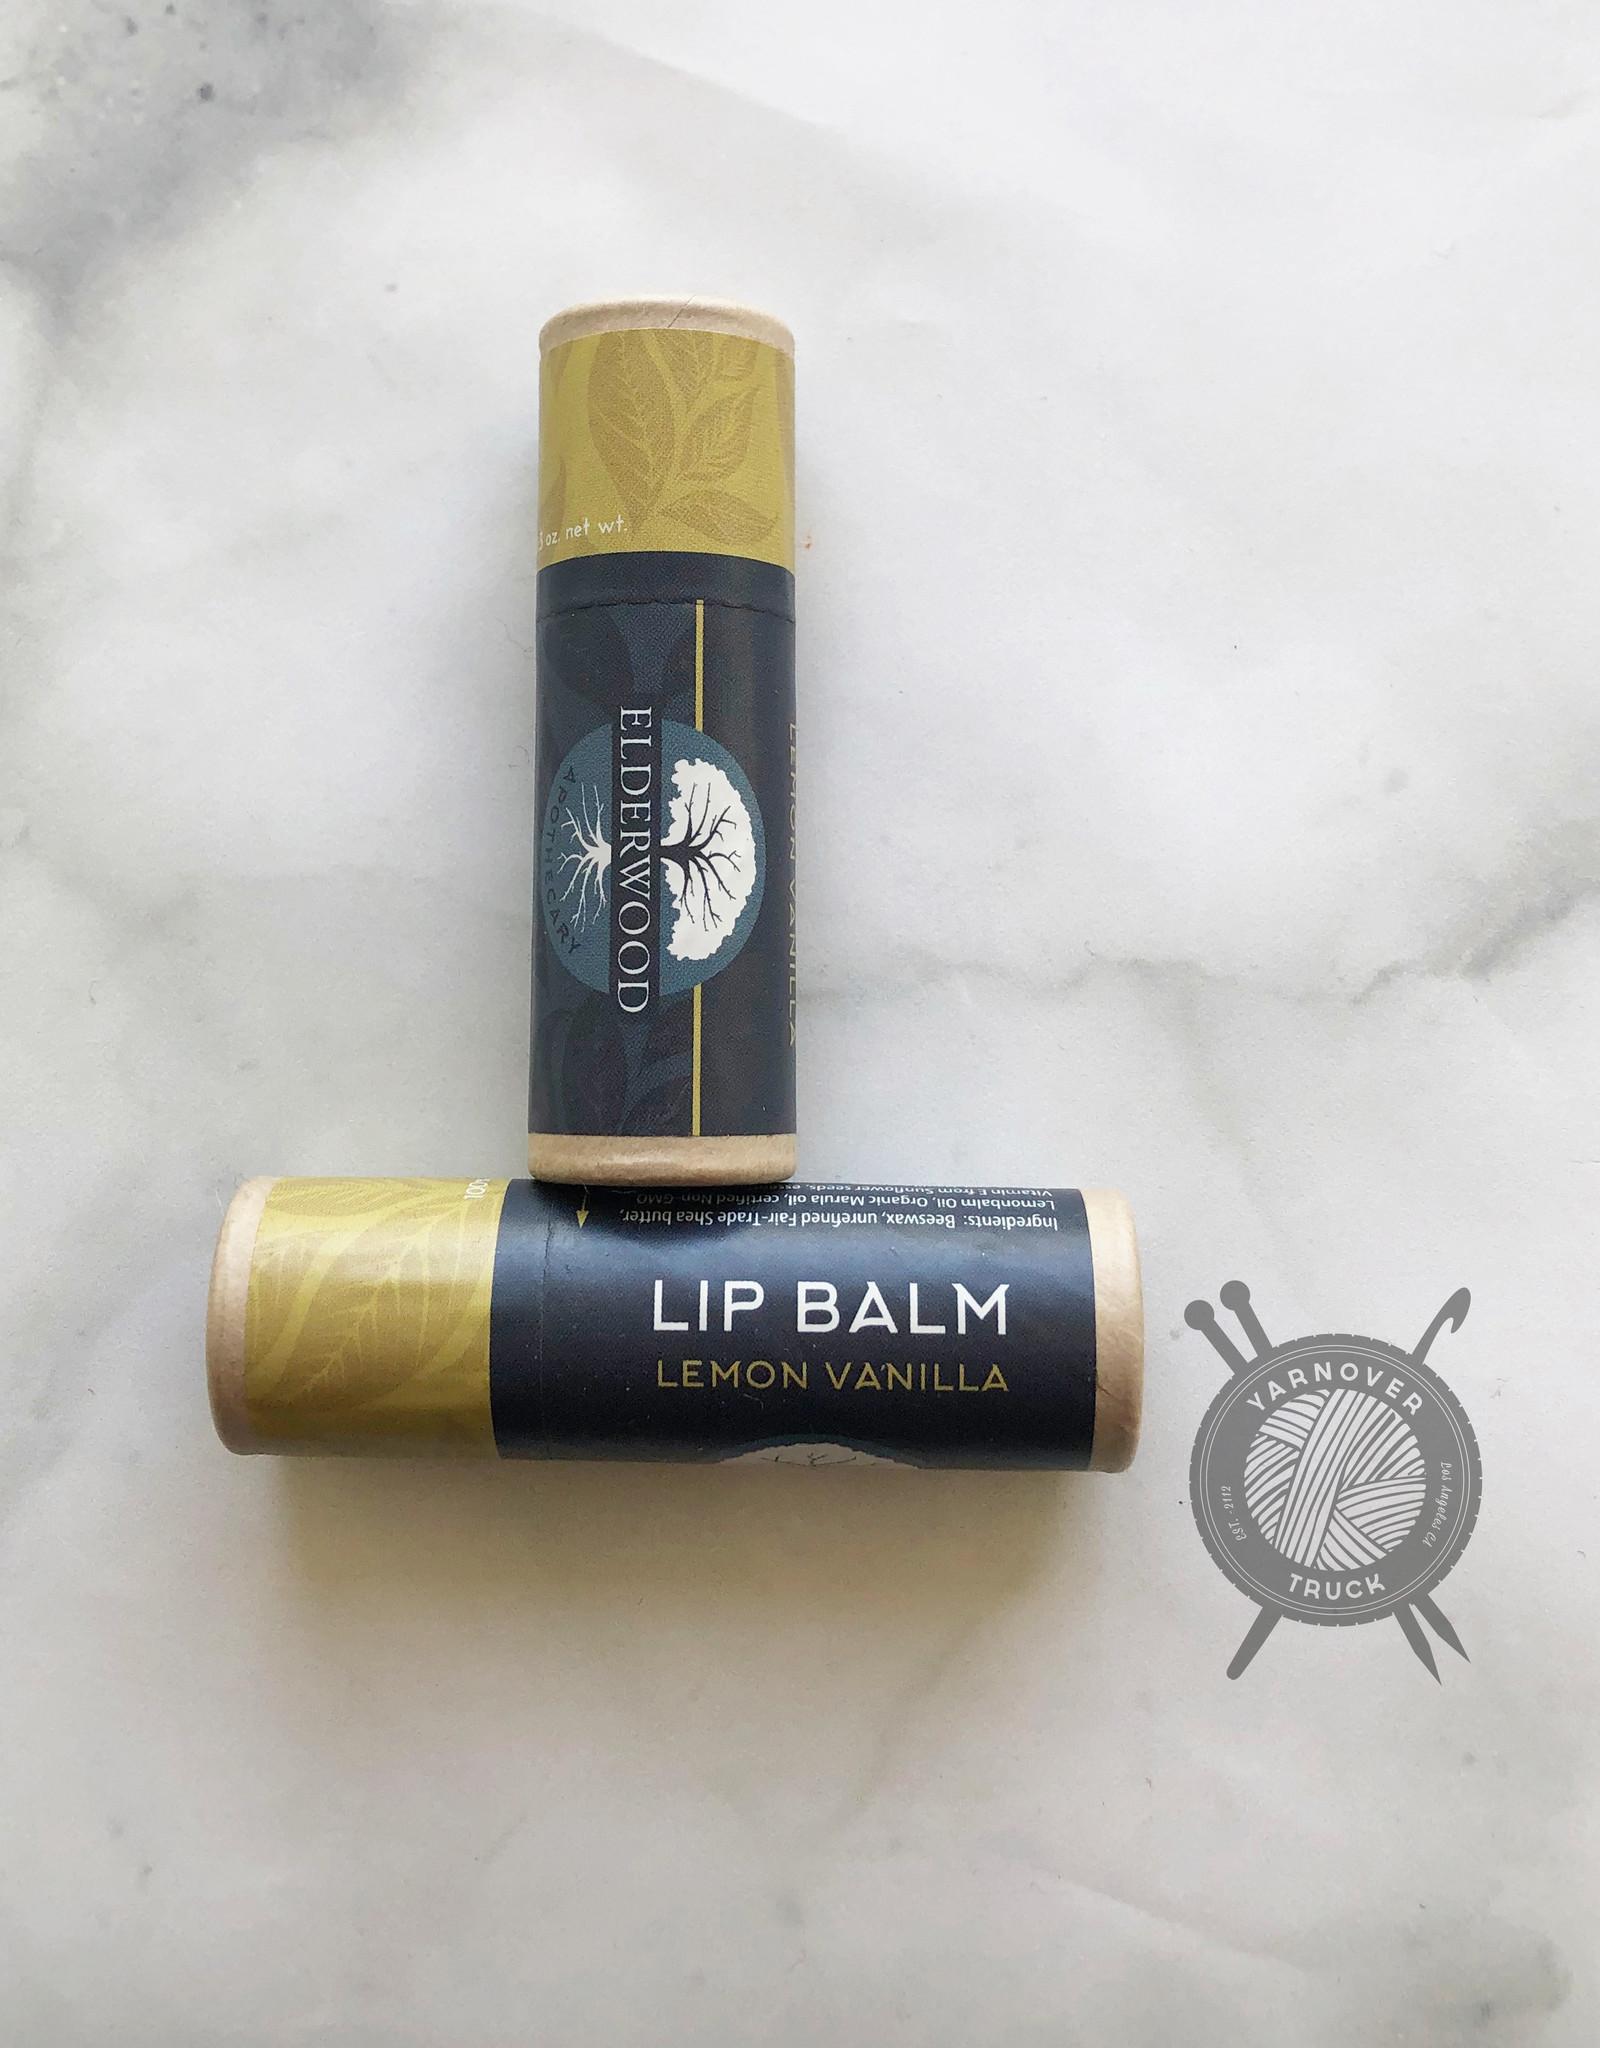 Lemon Vanilla Lip Balm  from Elderwood Apothecary